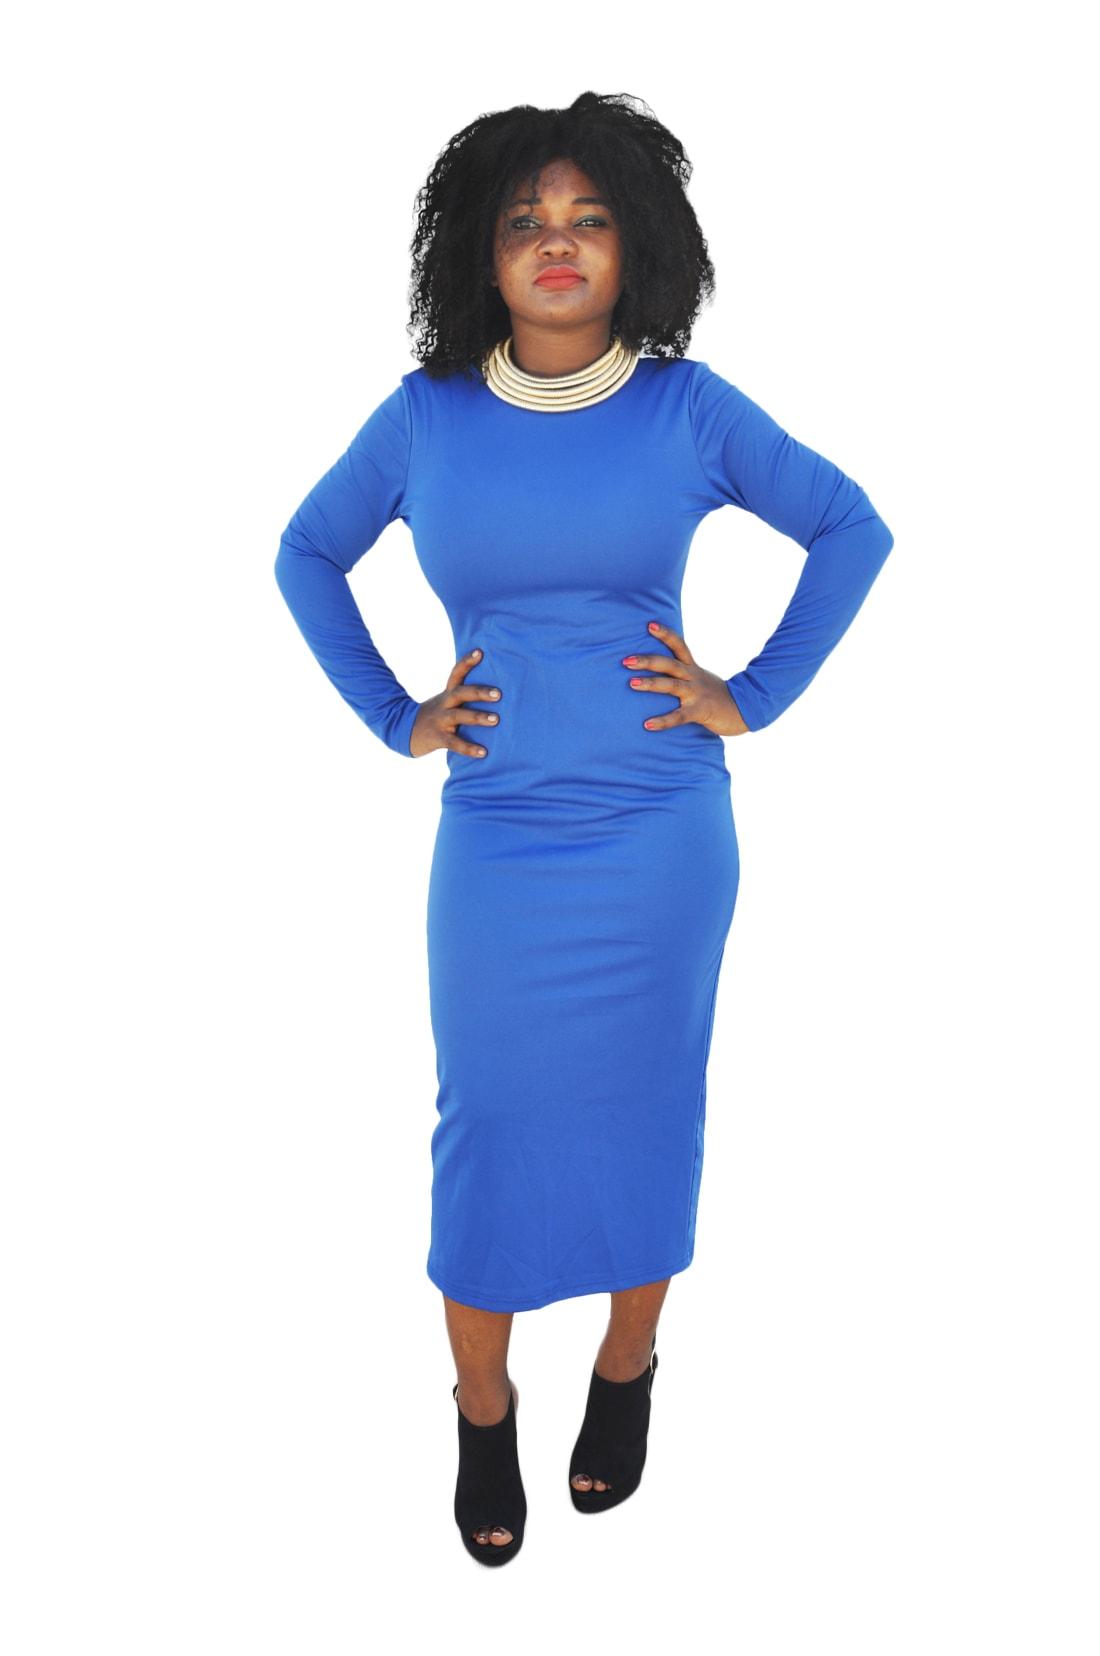 M0185 blue15 Office Evening Dresses maureens.com boutique